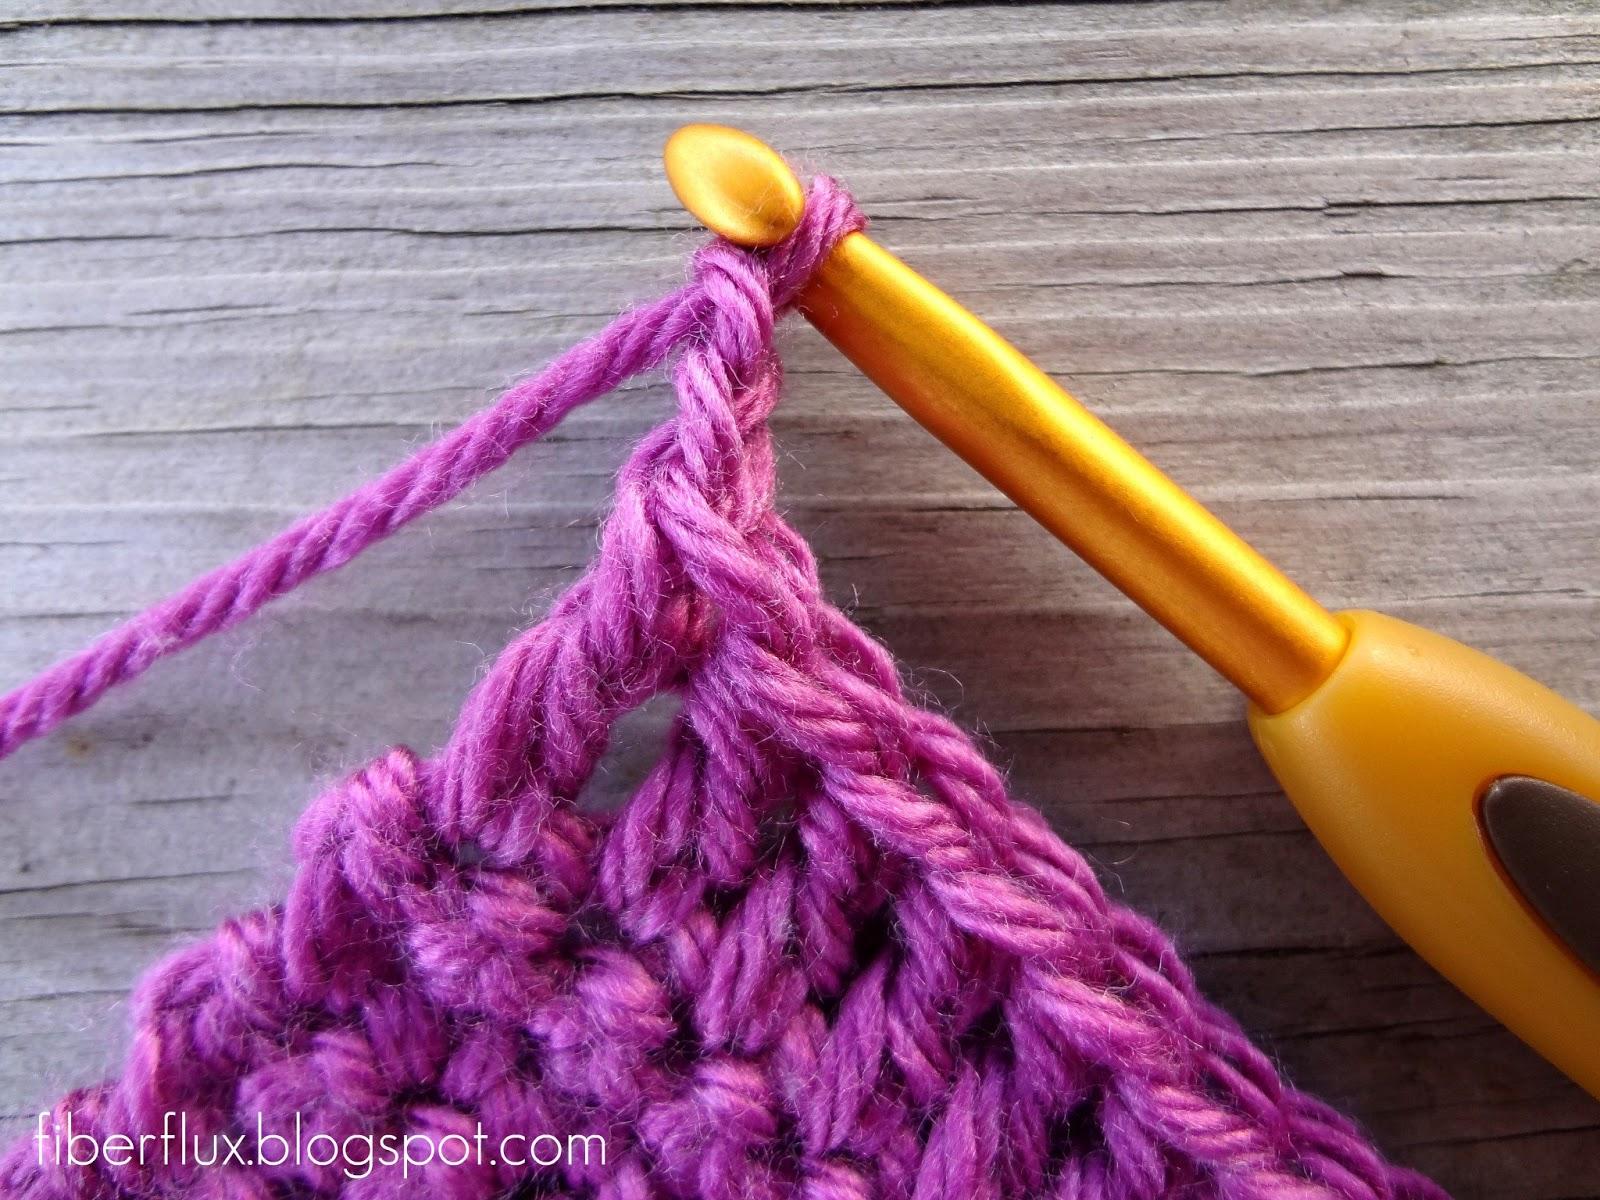 Striped Half Double Crochet Dishcloth Pattern | Stitching ...